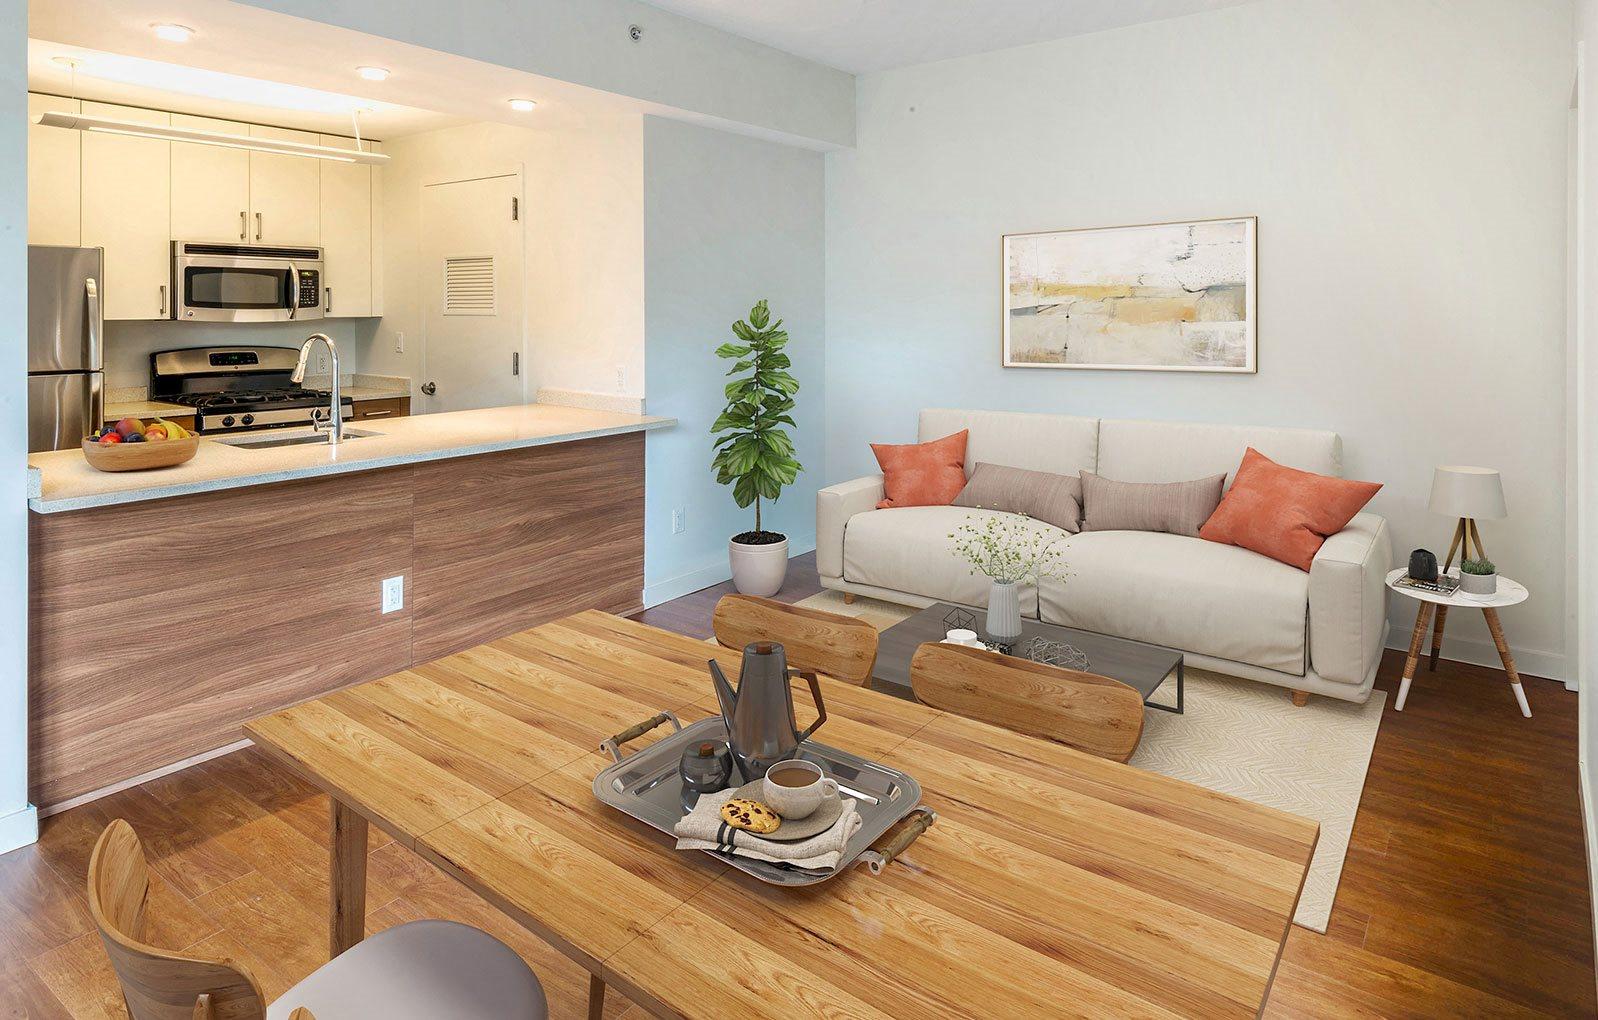 Open Concept Floor Plans at 544 Union, Williamsburg, New York, 11211